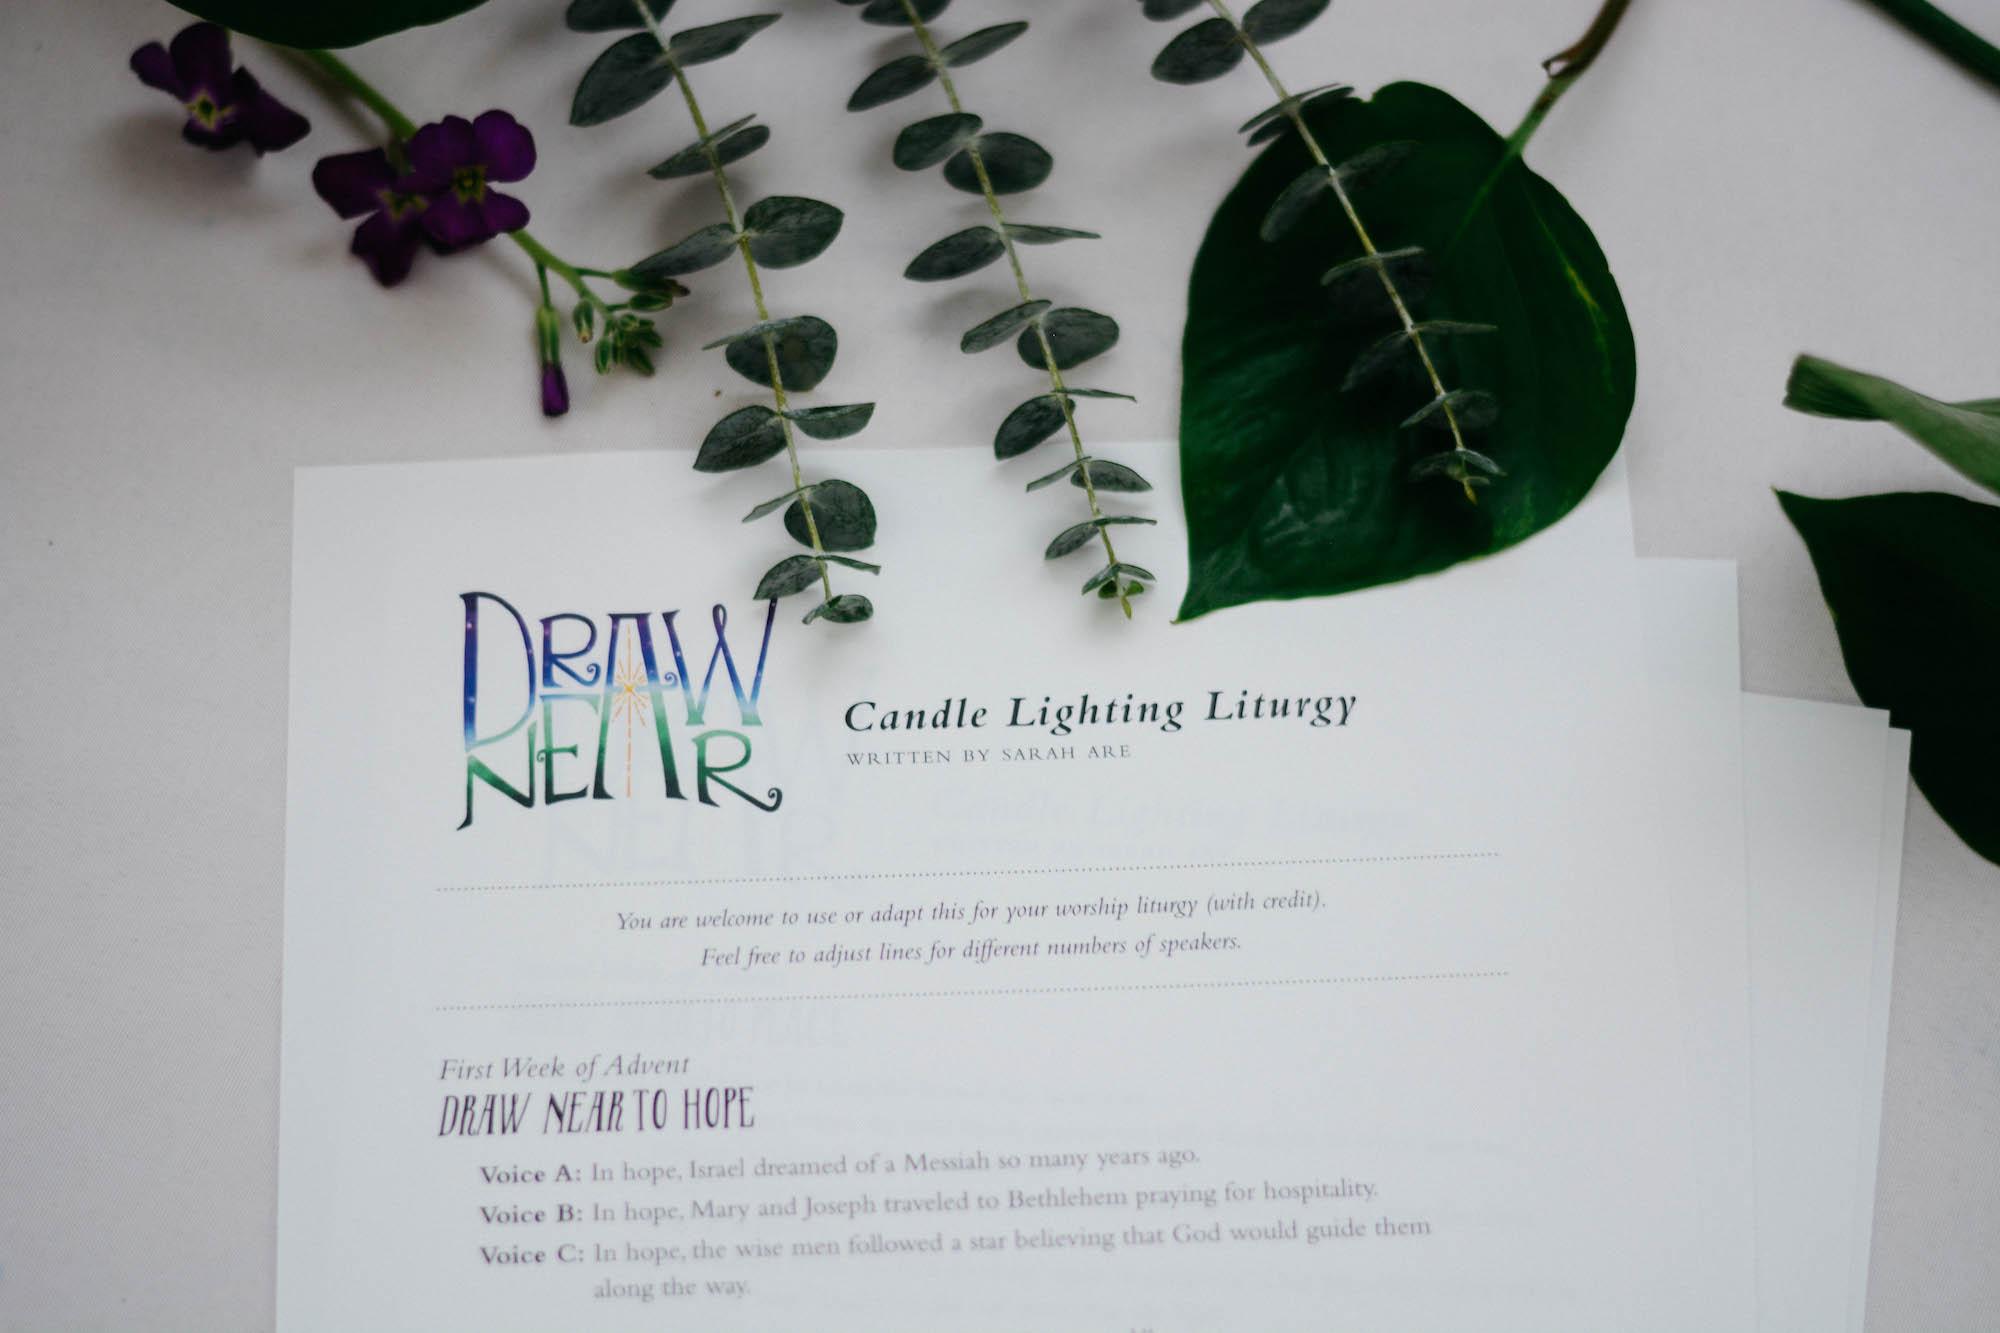 draw_near_candle-lighting.jpg